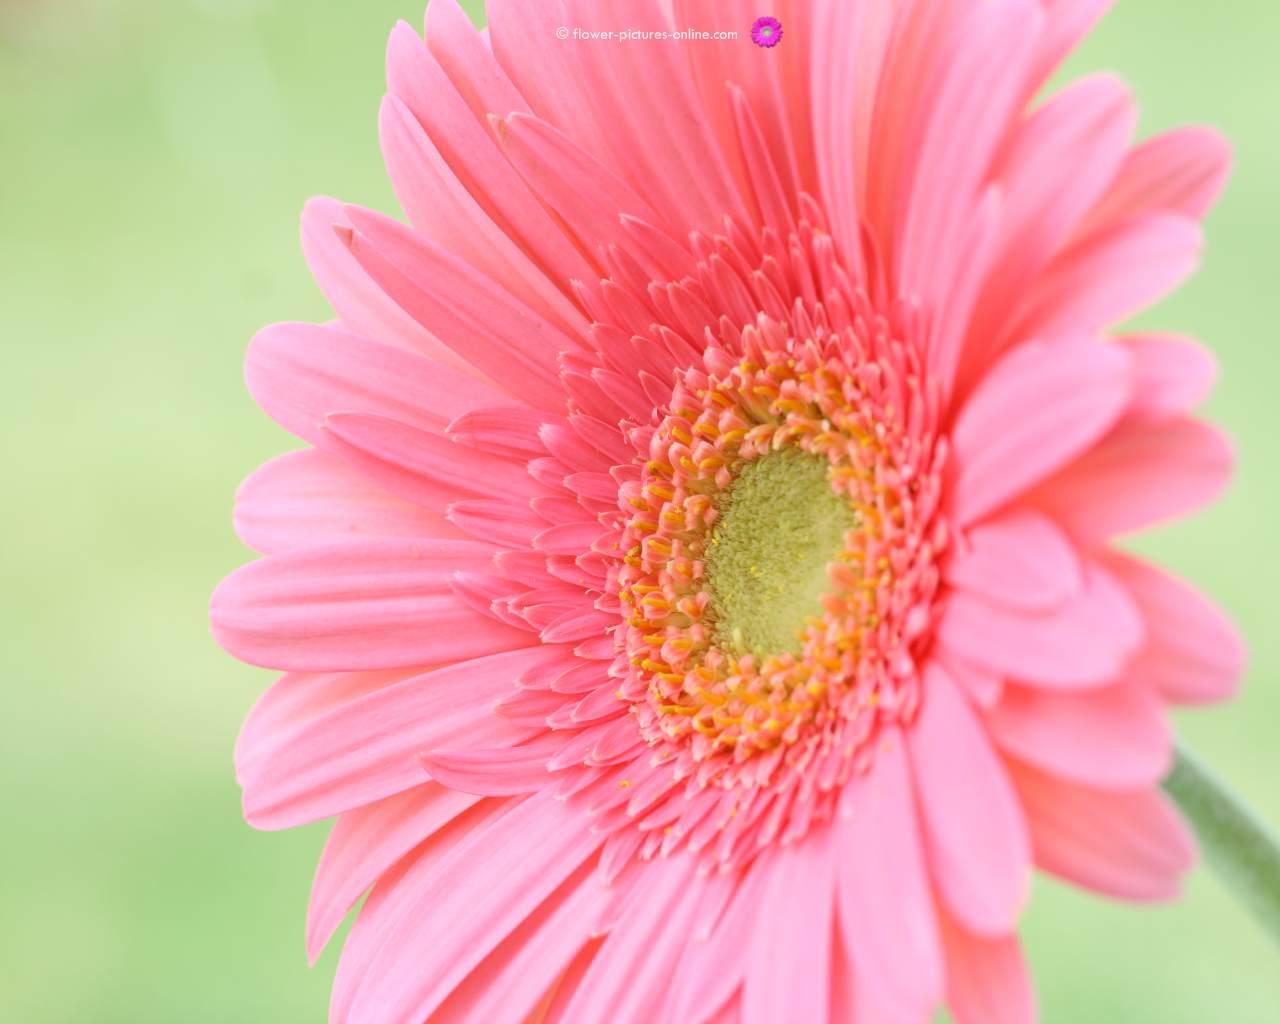 pink flower wallpaper flower wallpapers flower wallpaper pink flower 1280x1024